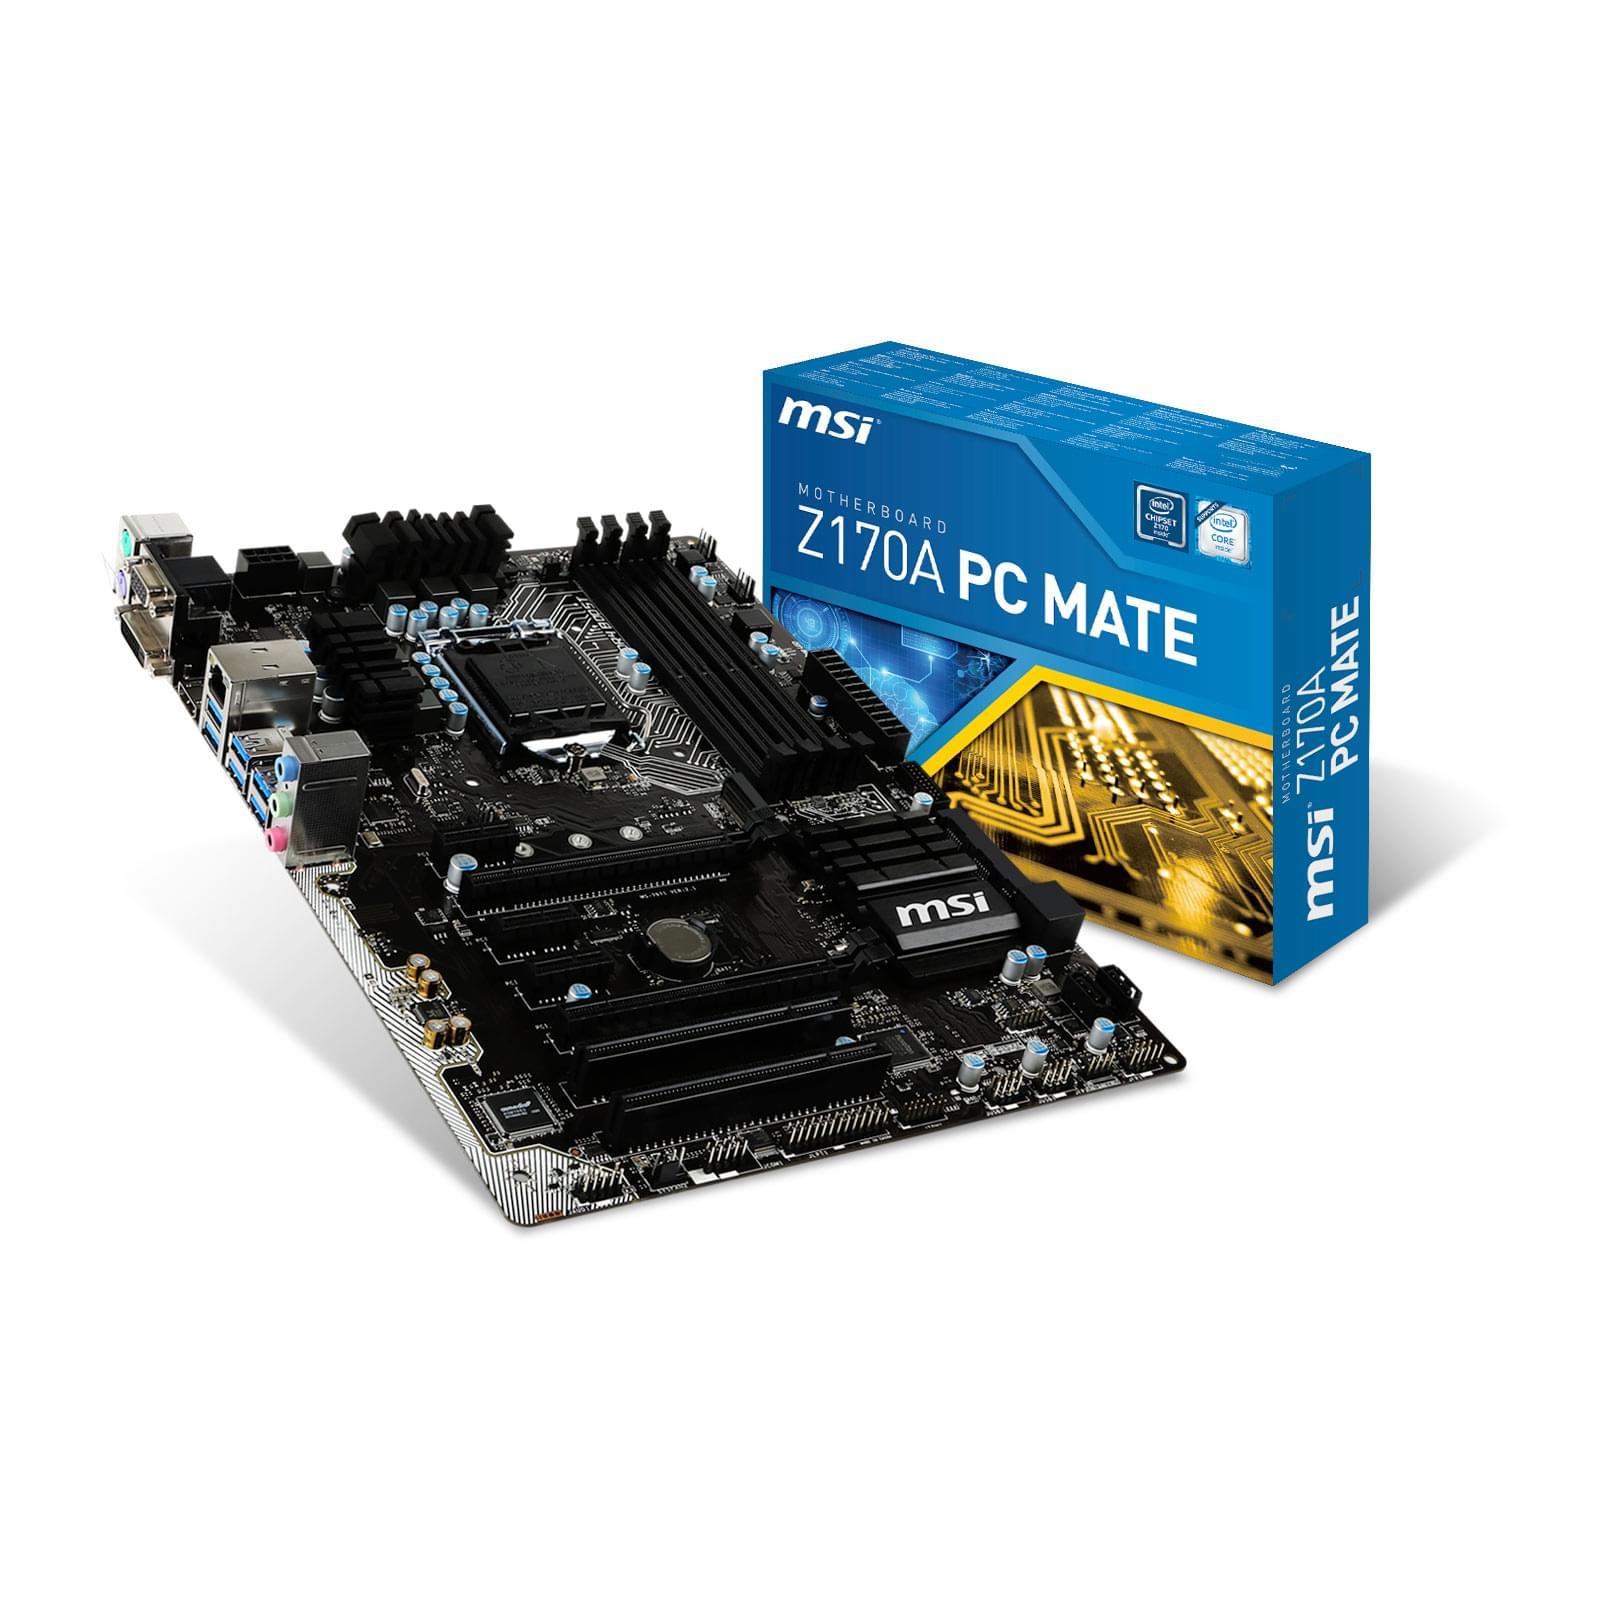 MSI Z170A PC MATE (Z170A PC MATE) - Achat / Vente Carte Mère sur Cybertek.fr - 0